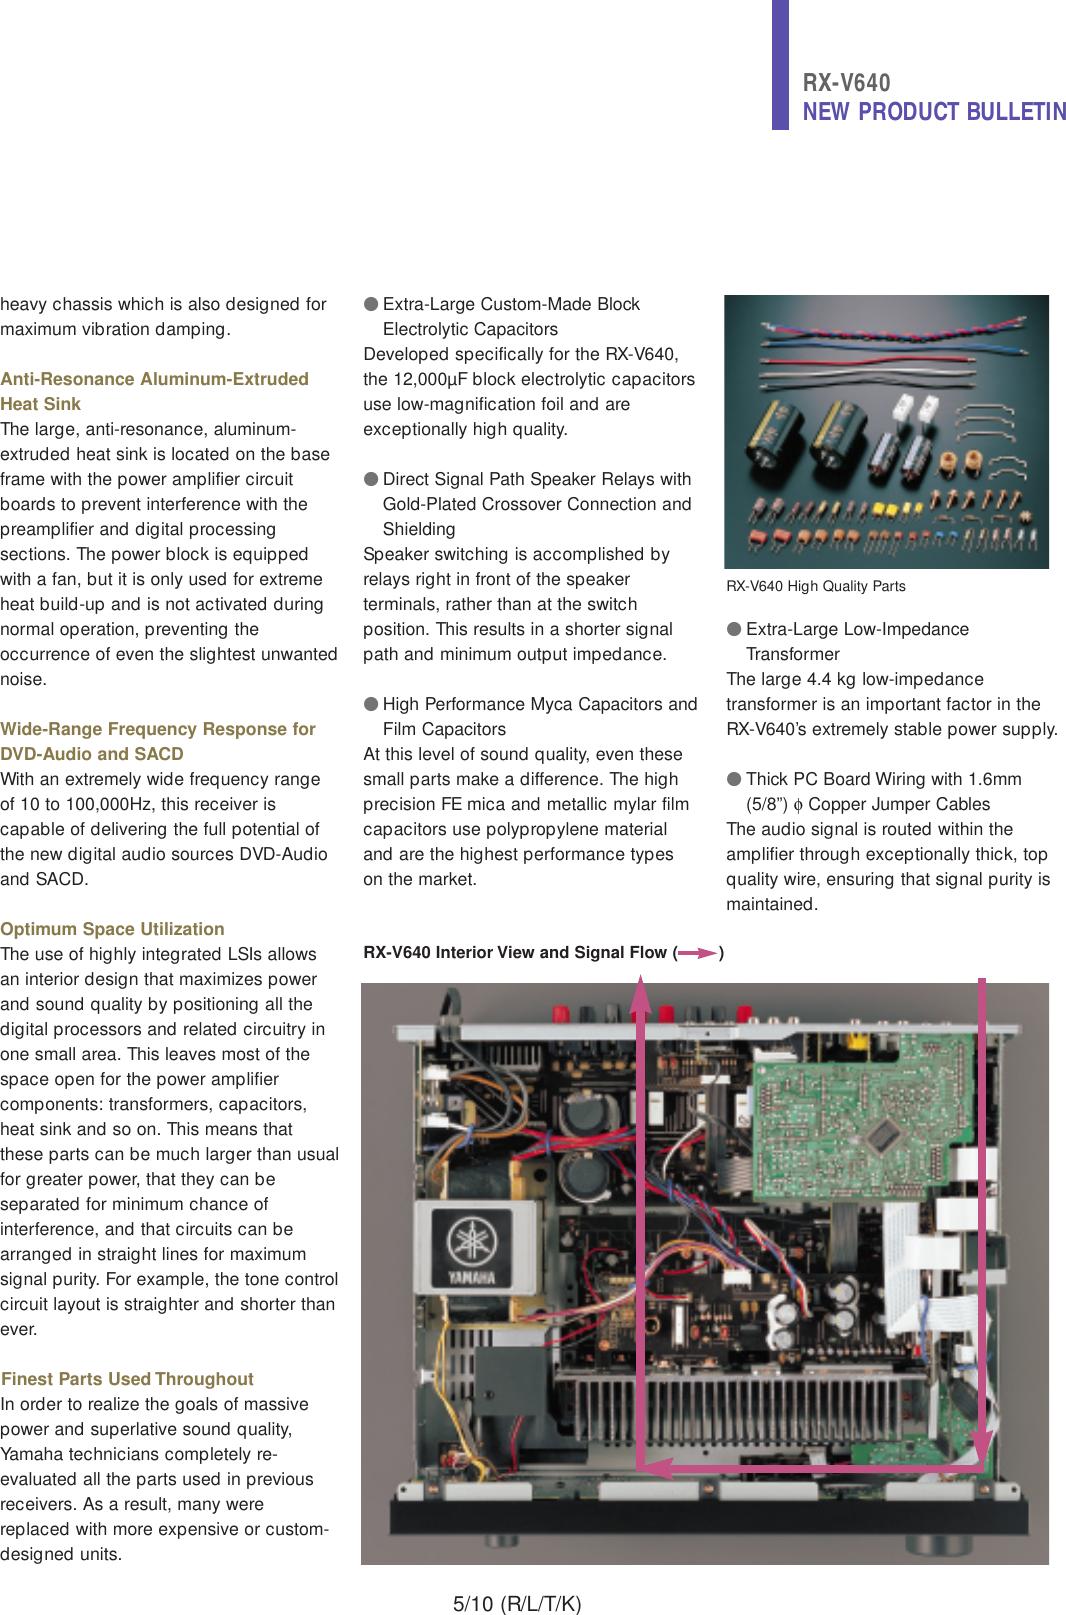 Yamaha Rx V640 Users Manual